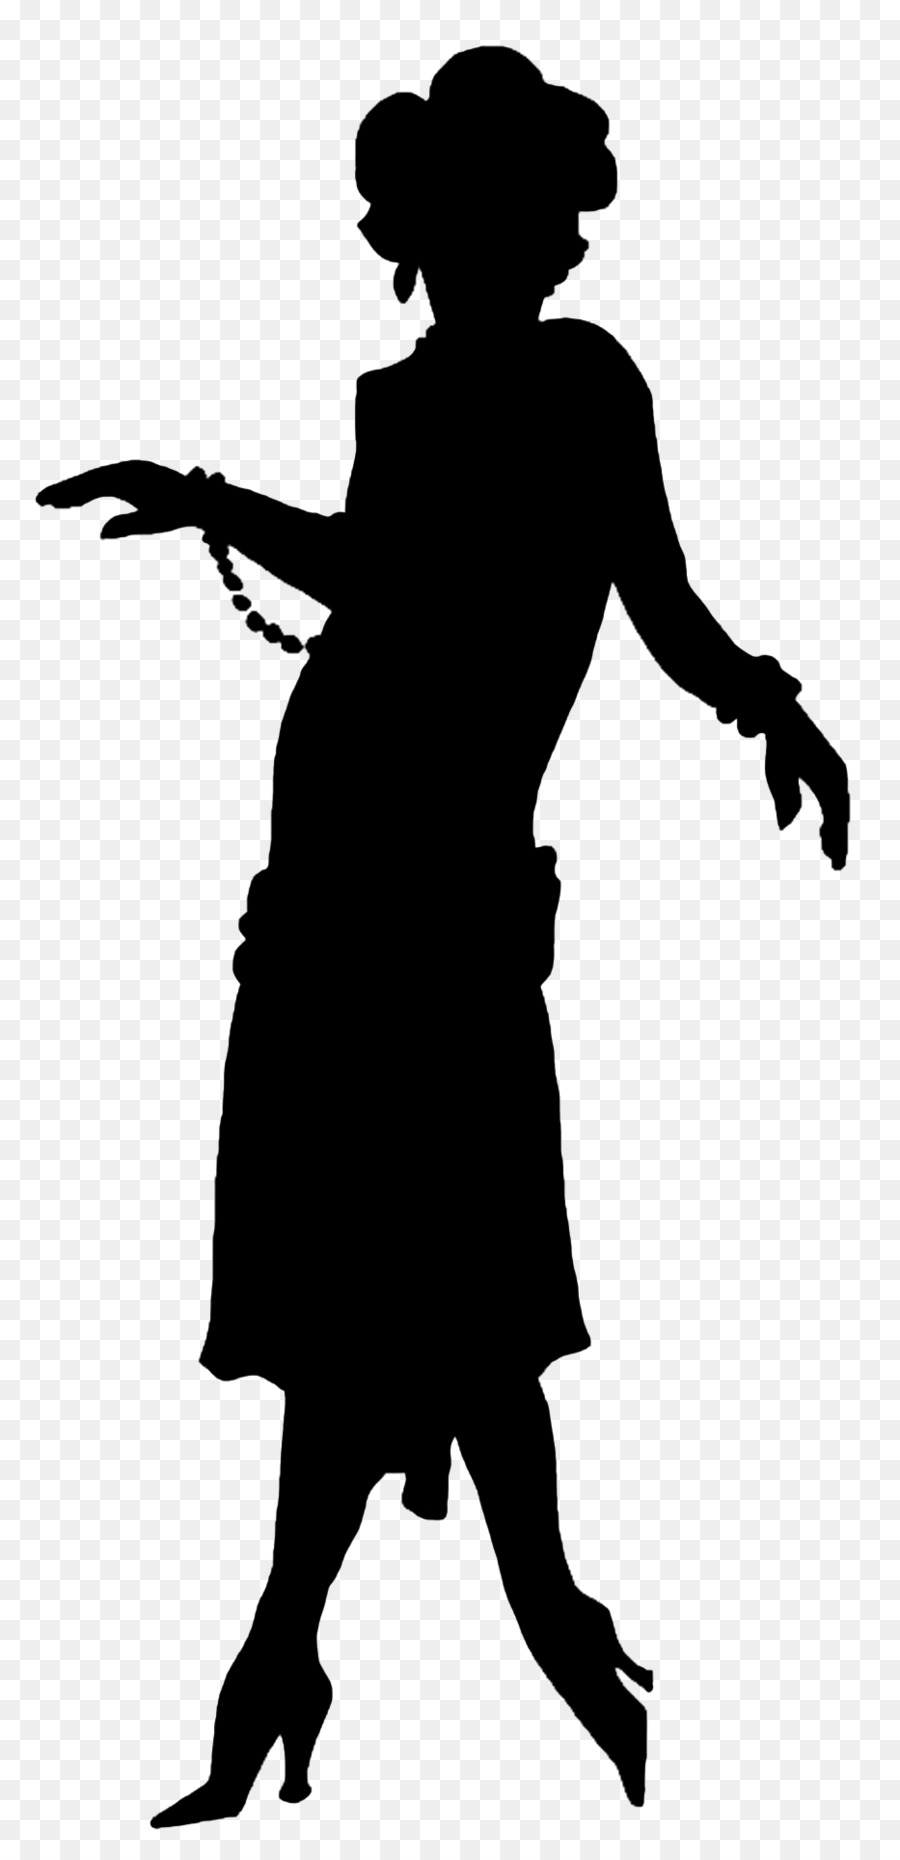 1920s silhouette clip art the incredibles png download 933 1927 rh kisspng com 1940s clip art 1920s clipart borders